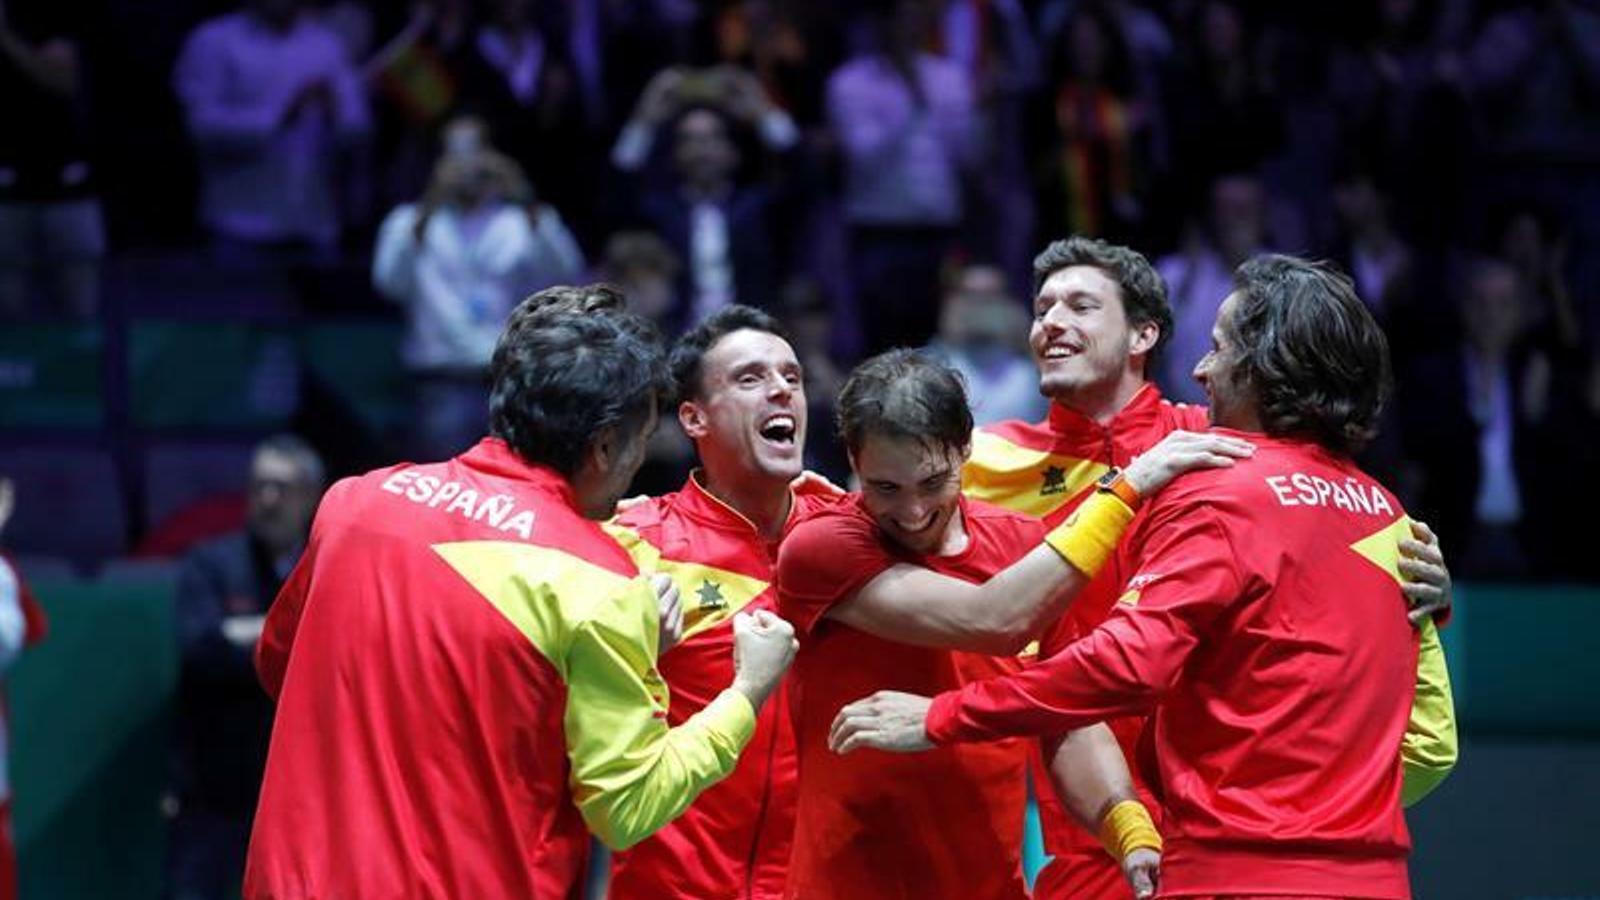 L'equip espanyol de Copa Davis celebra la victòria de Nadal i la sisena Copa Davis